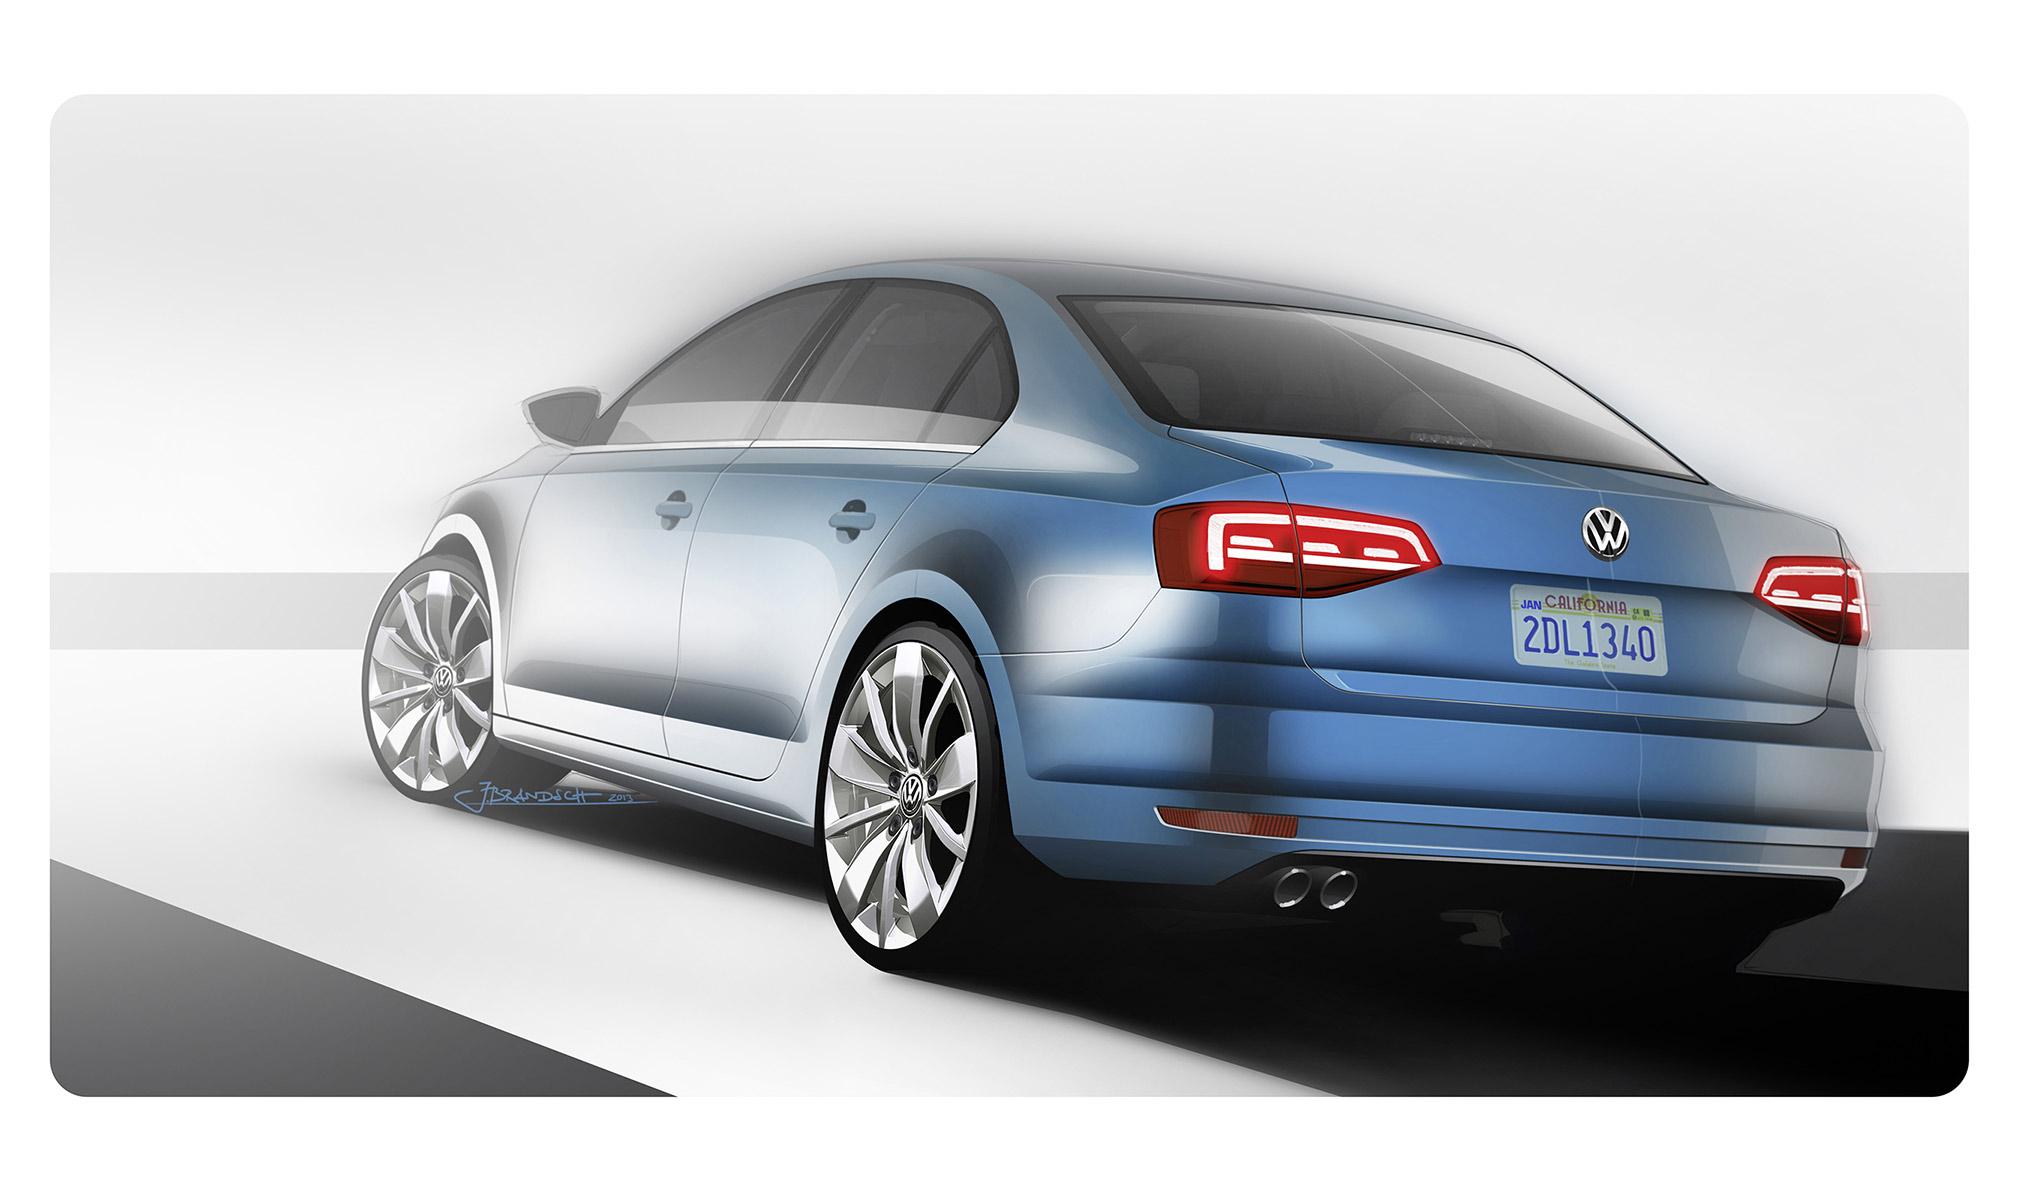 Audi S3 Sedan Looks Great With Vossen Japan Cvt Wheels